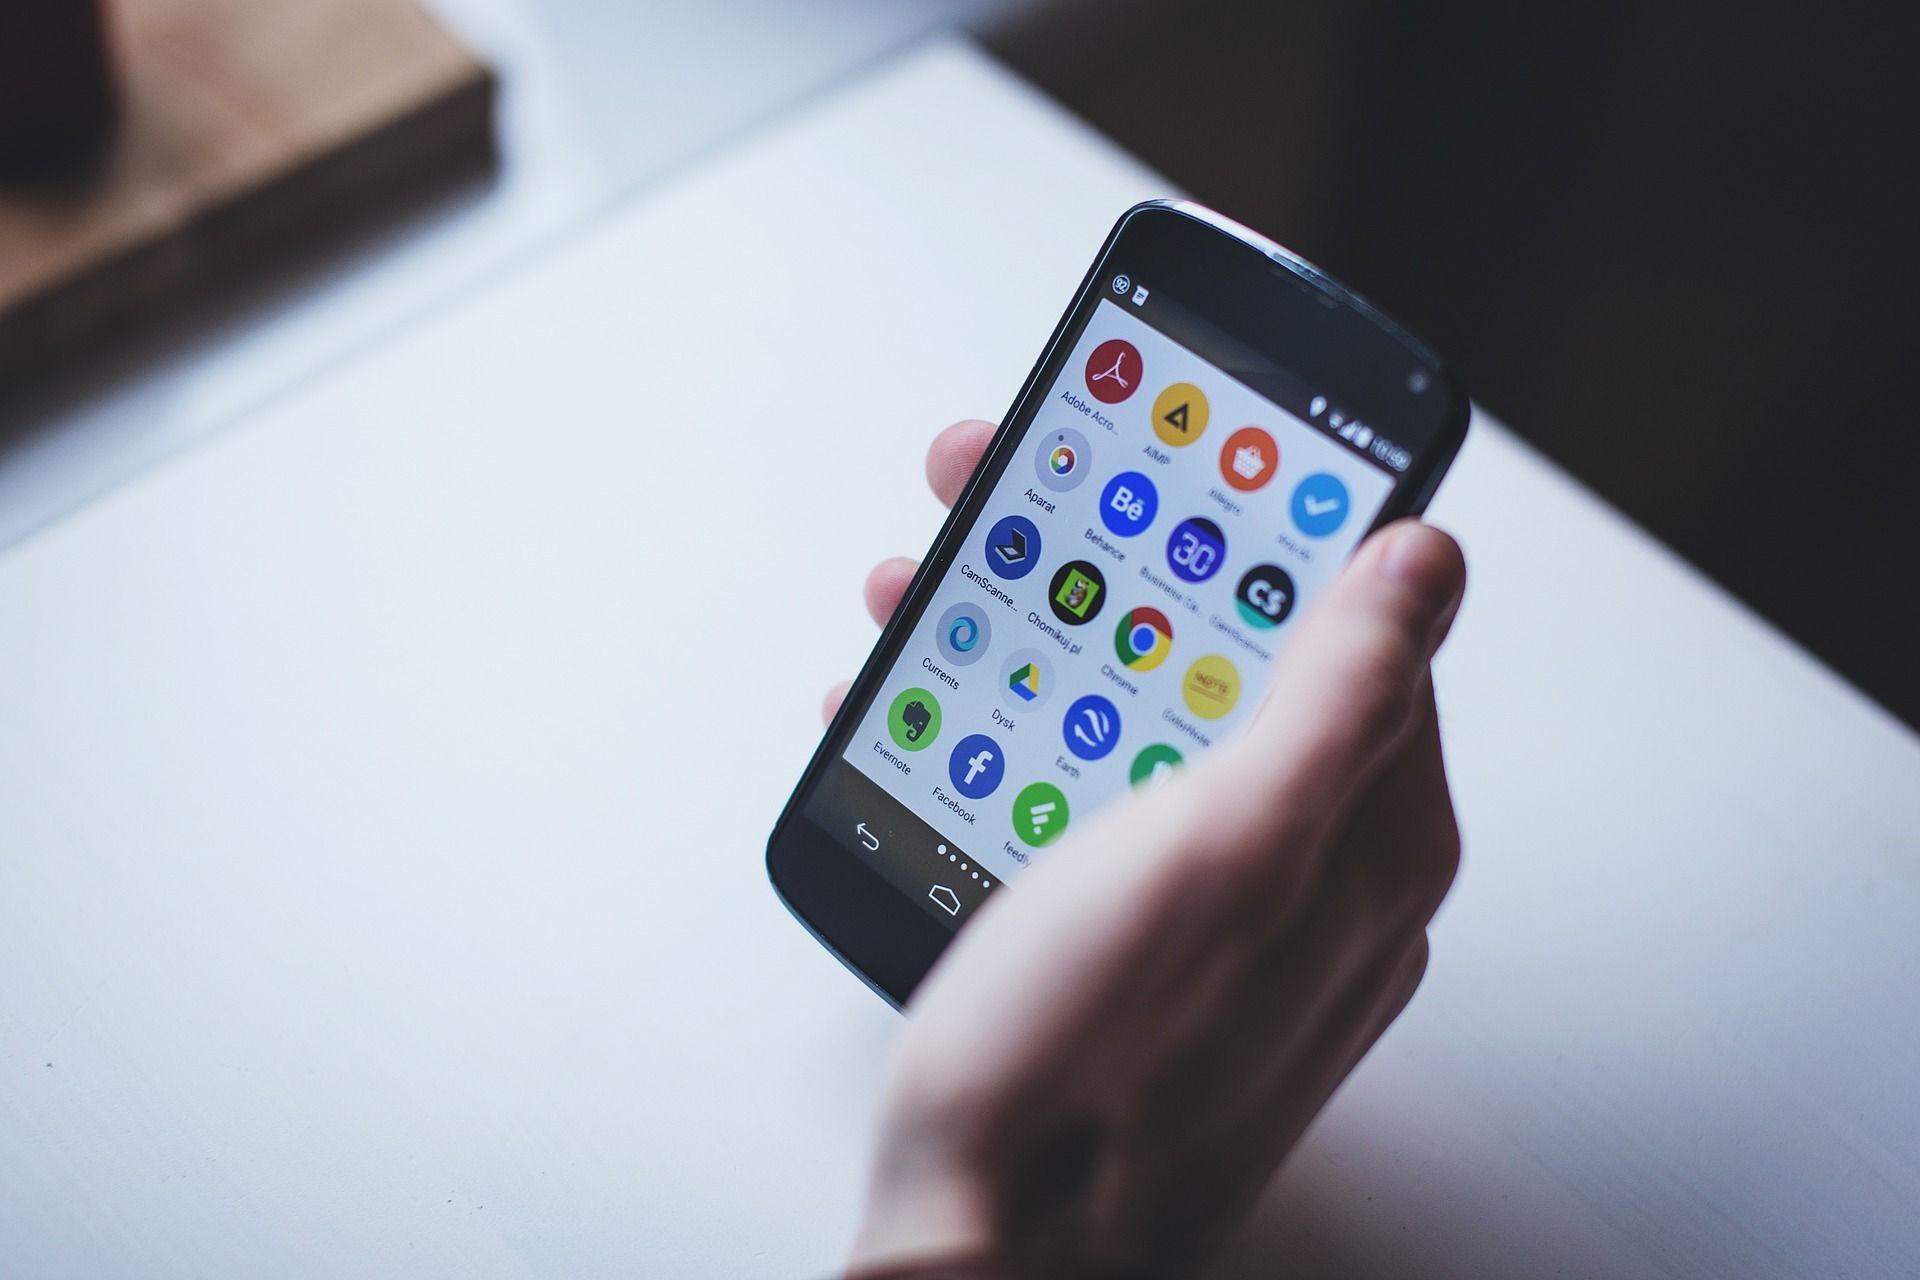 Coole Apps helfen bei vielen Dingen